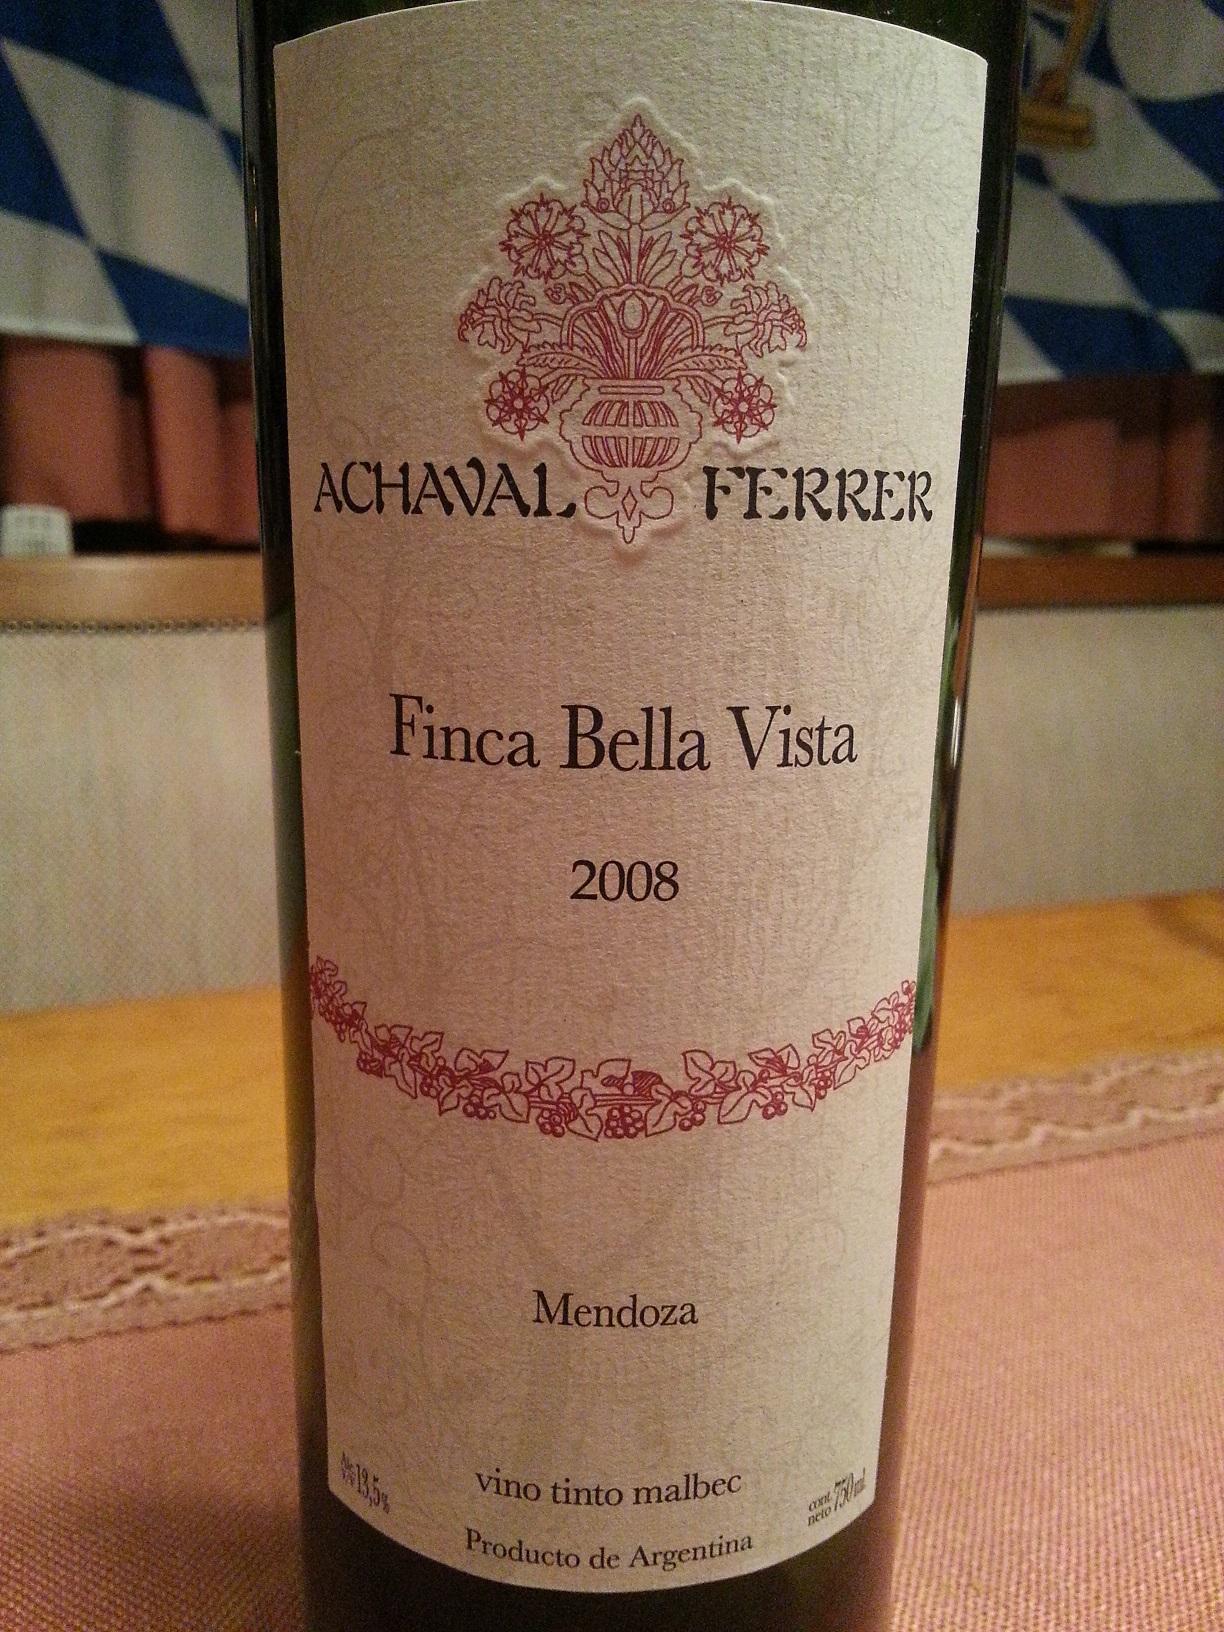 2008 Finca Bella Vista | Achaval Ferrer